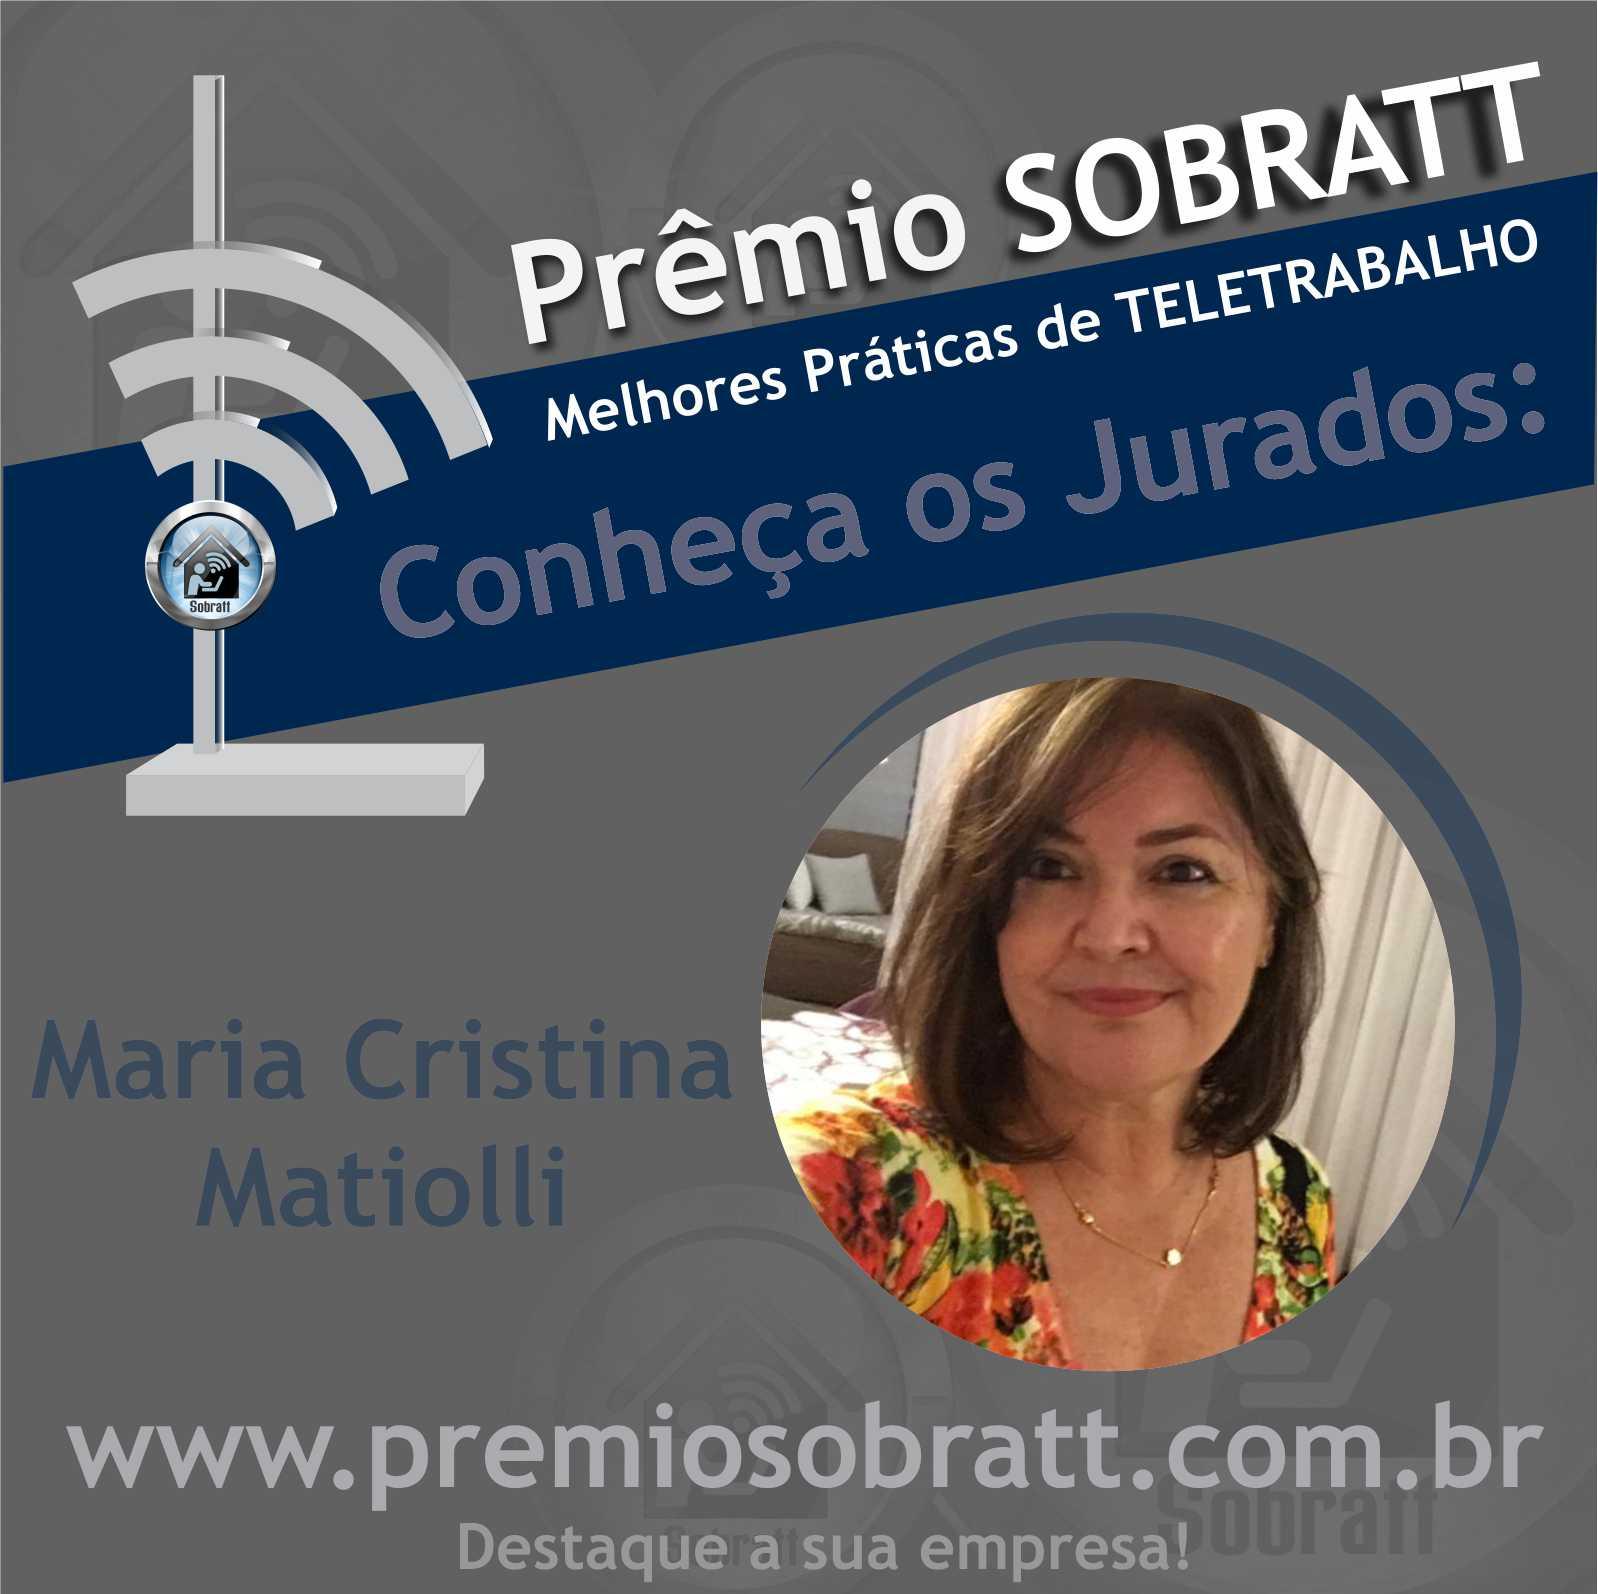 MARIA_CRIS_MATIOLLI